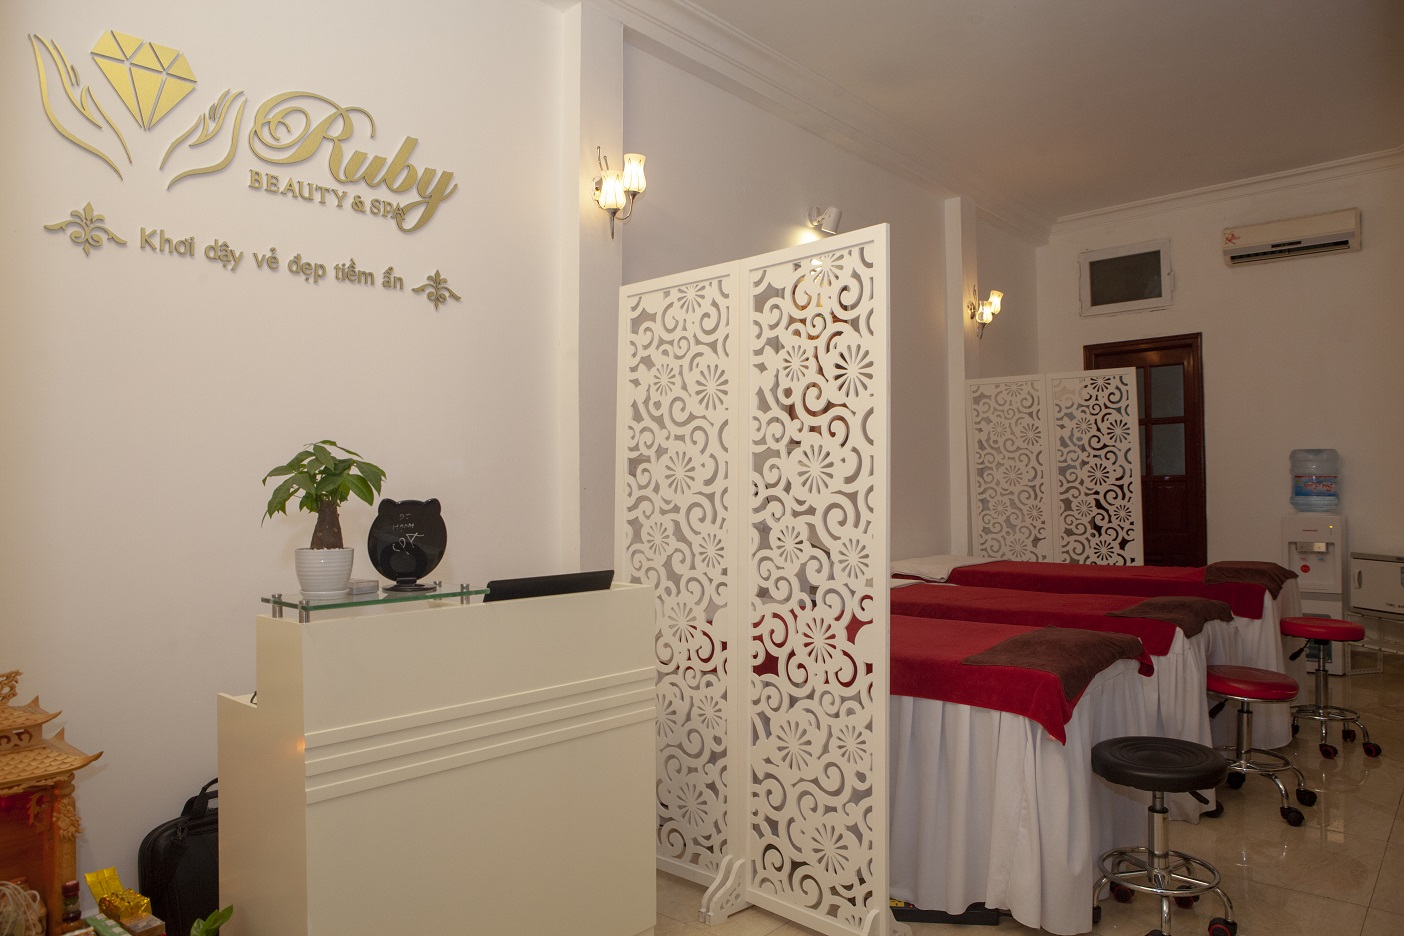 Đôi nét vềRuby Beauty & Spa 1